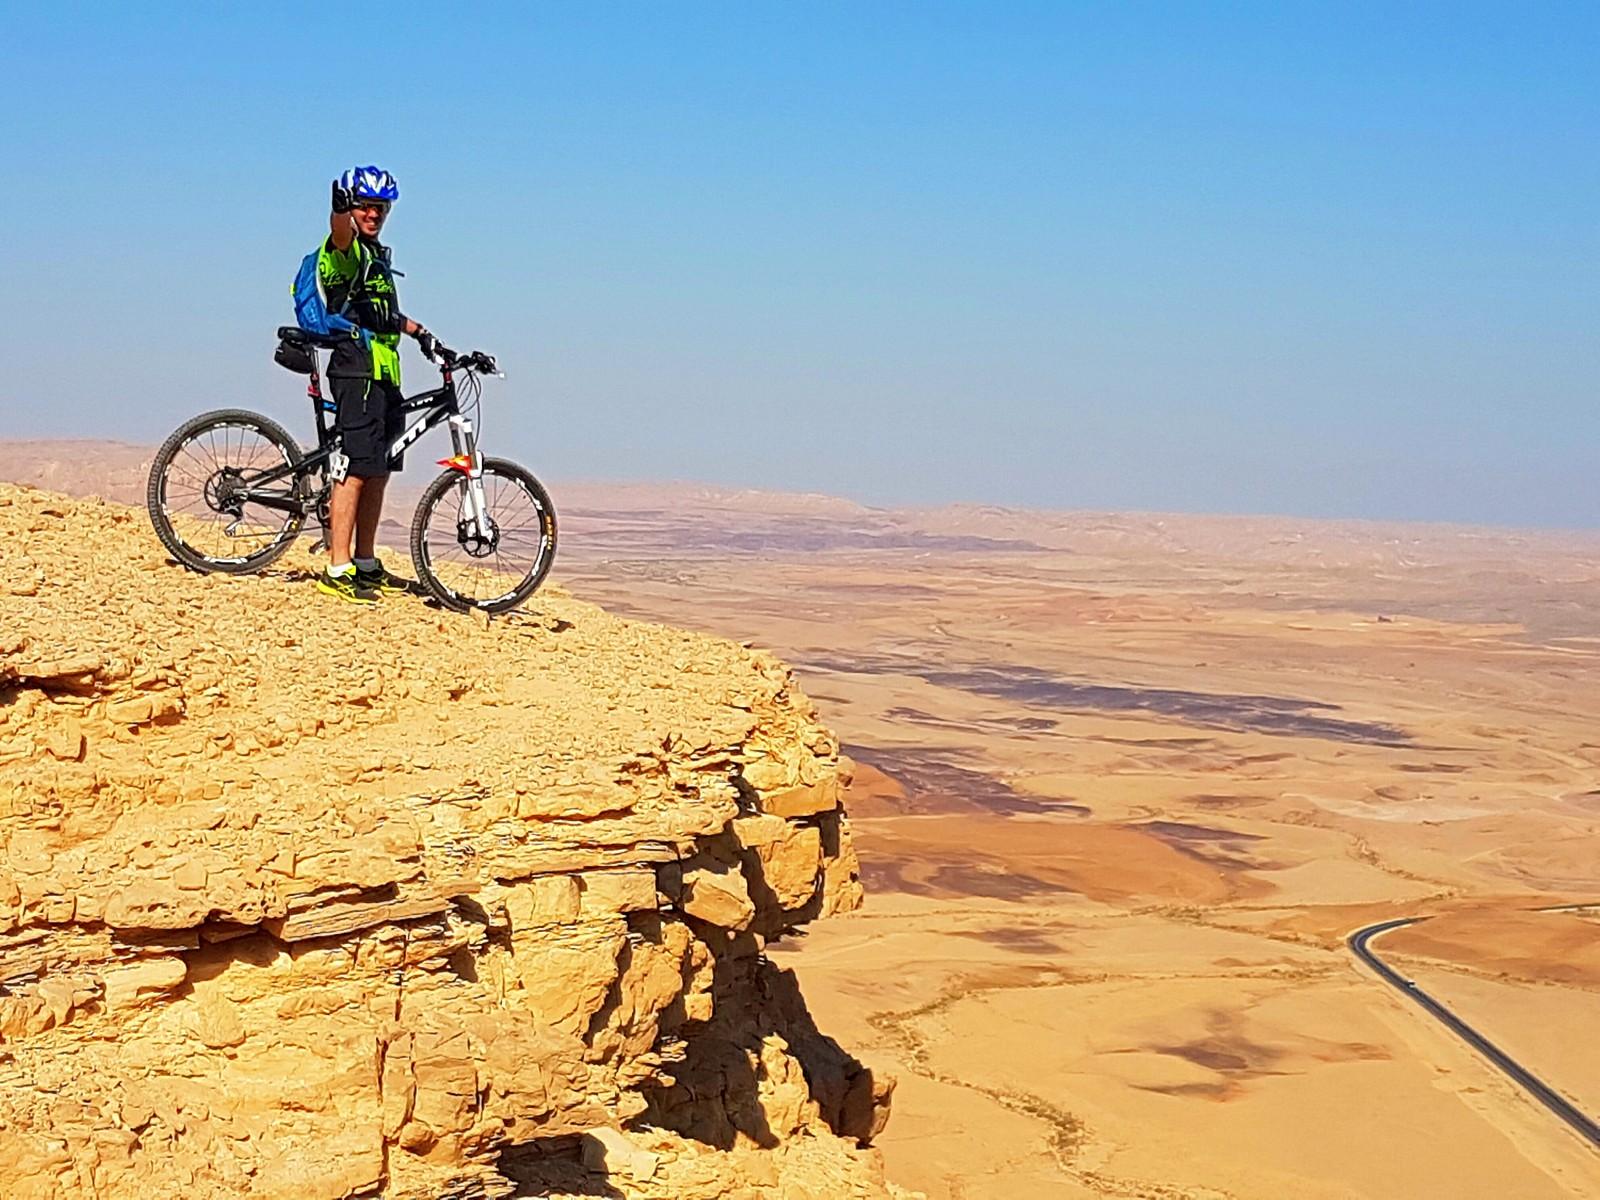 CYMERA 20190630 191822 - guy191184 - Mountain Biking Pictures - Vital MTB